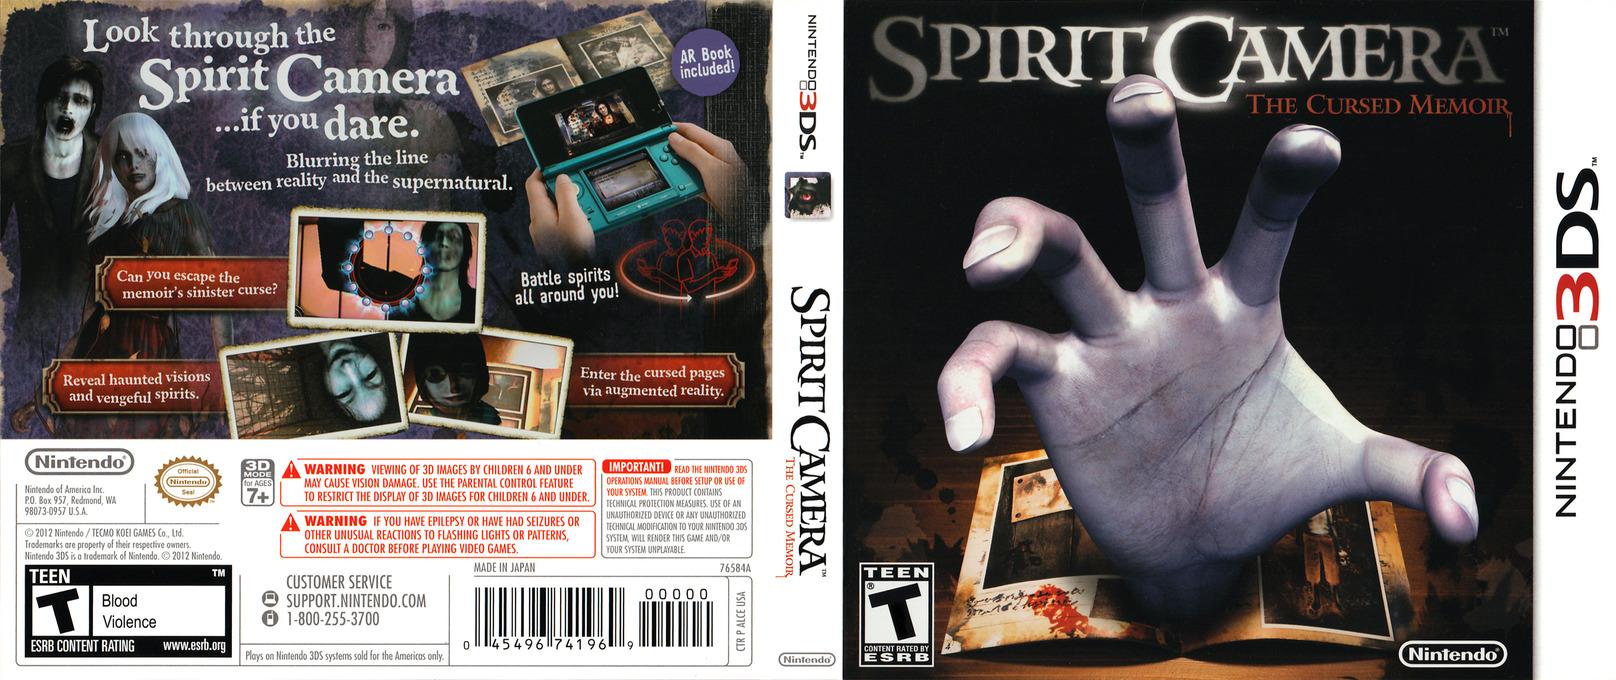 Spirit Camera - The Cursed Memoir 3DS coverfullHQ (ALCE)